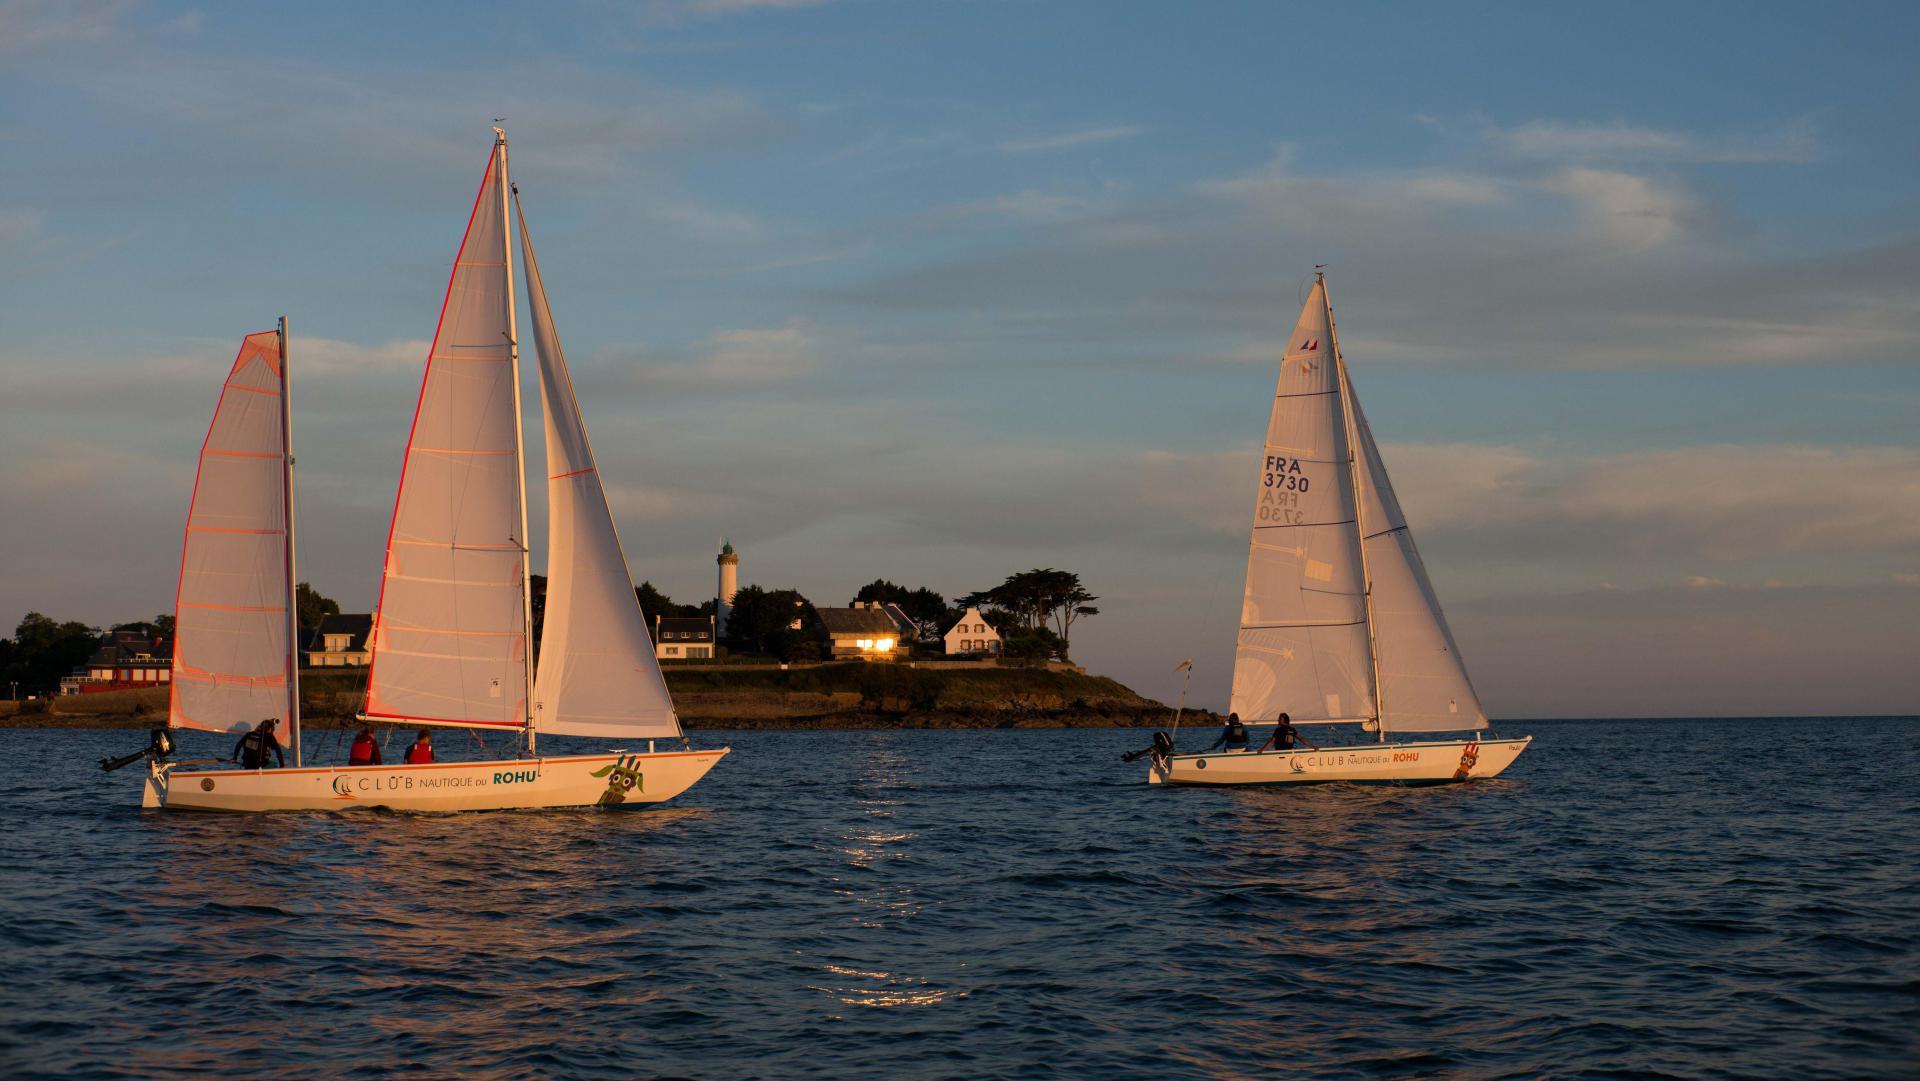 Balade nautique en Mentor - Sortie du Golfe du Morbihan